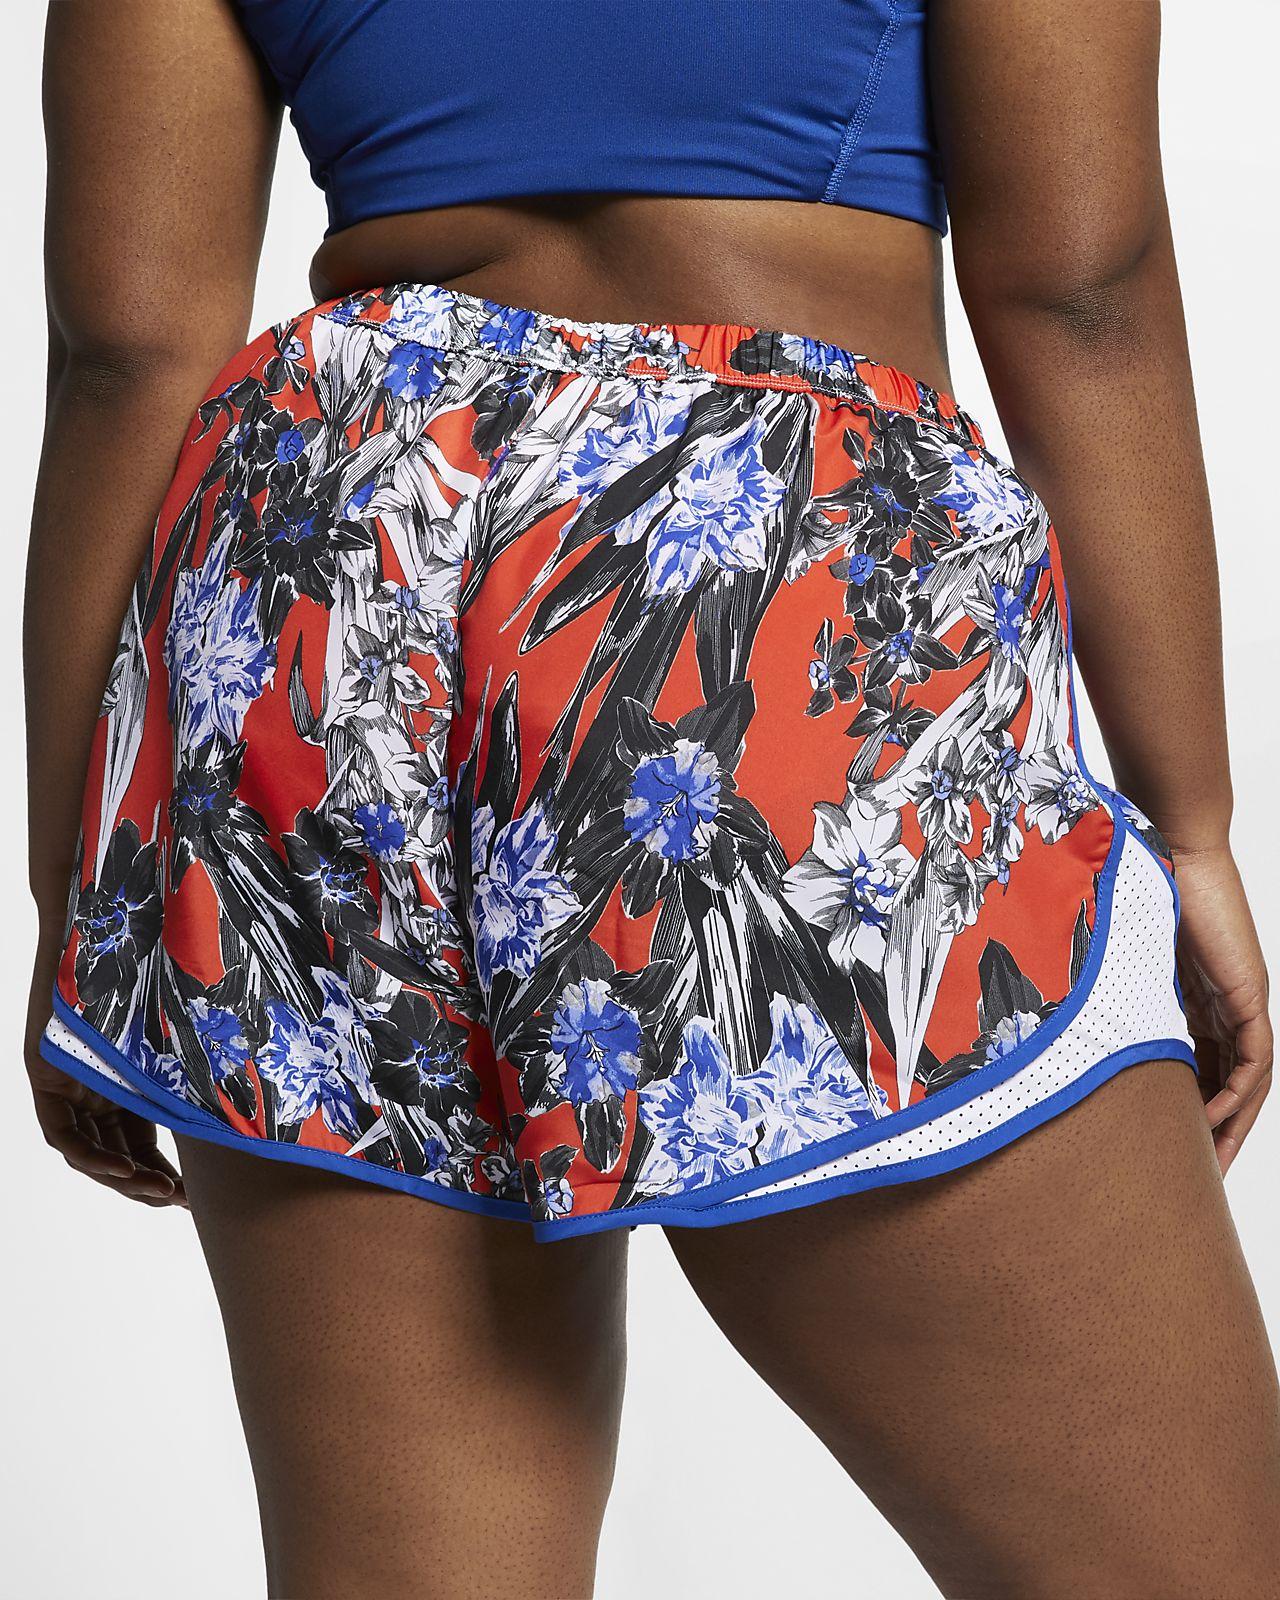 7613169cc1670 Nike Tempo Women s Floral Running Shorts (Plus Size). Nike.com